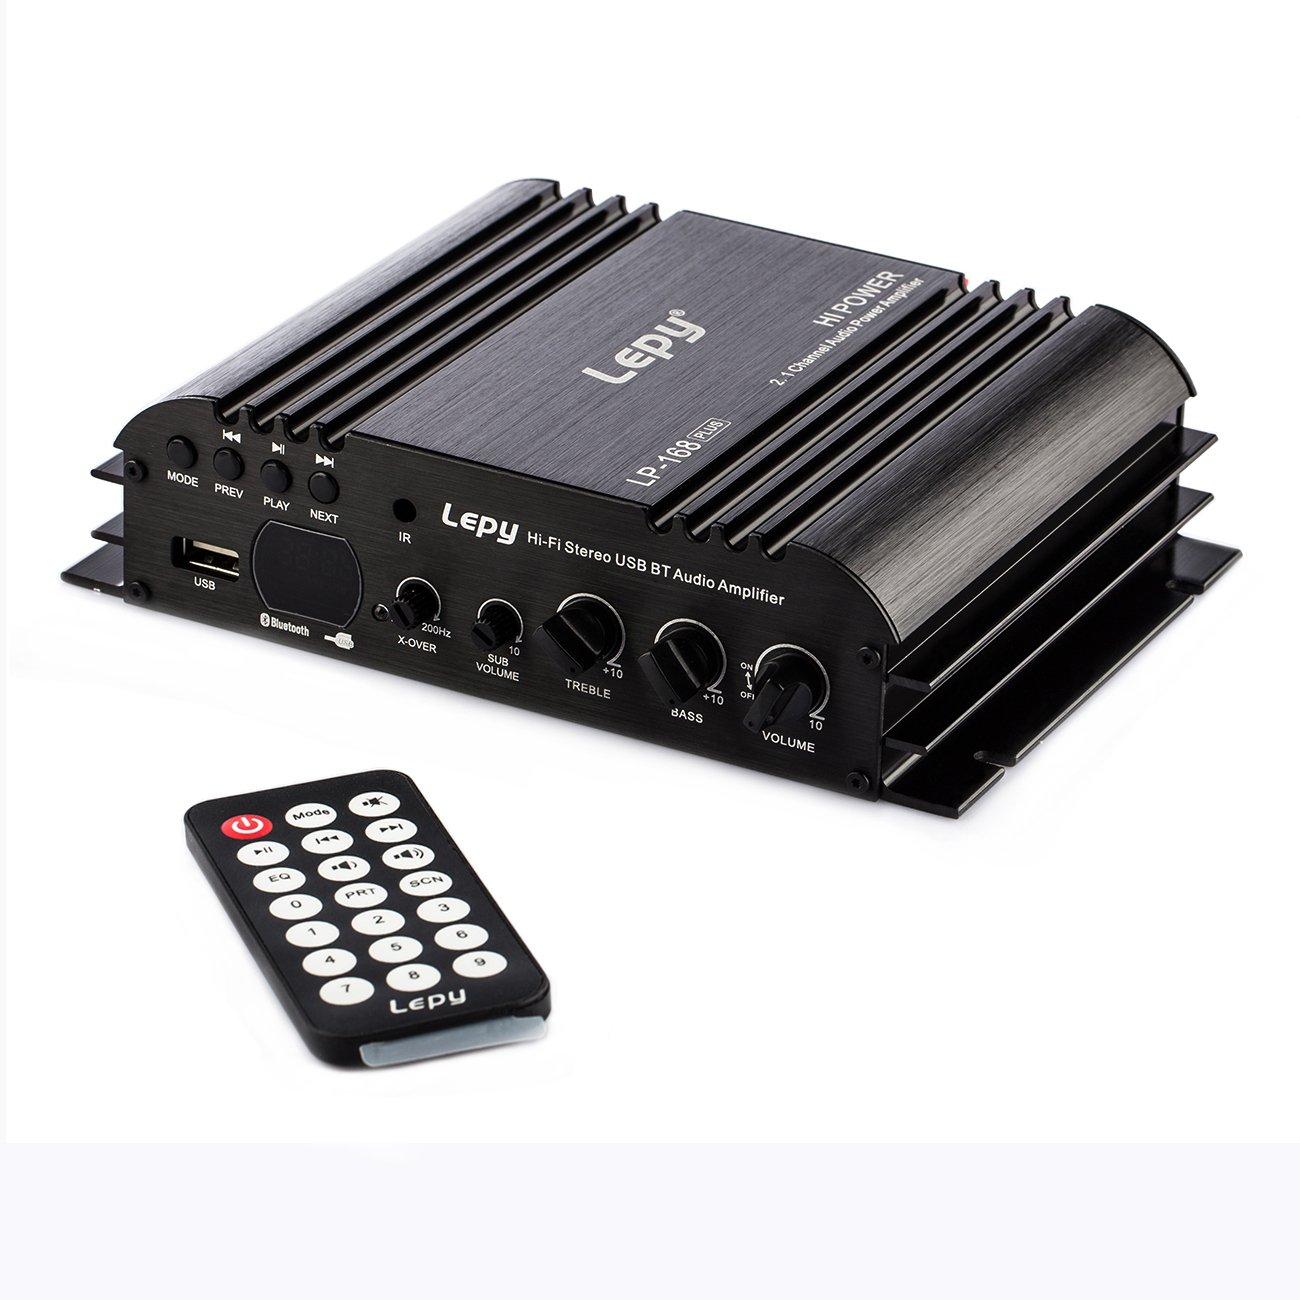 Lepy LP-168plus Hi-Fi Stereo USB BT Audio Amplifier with Power Adapter& Remote Control LP-Amp168PLUS